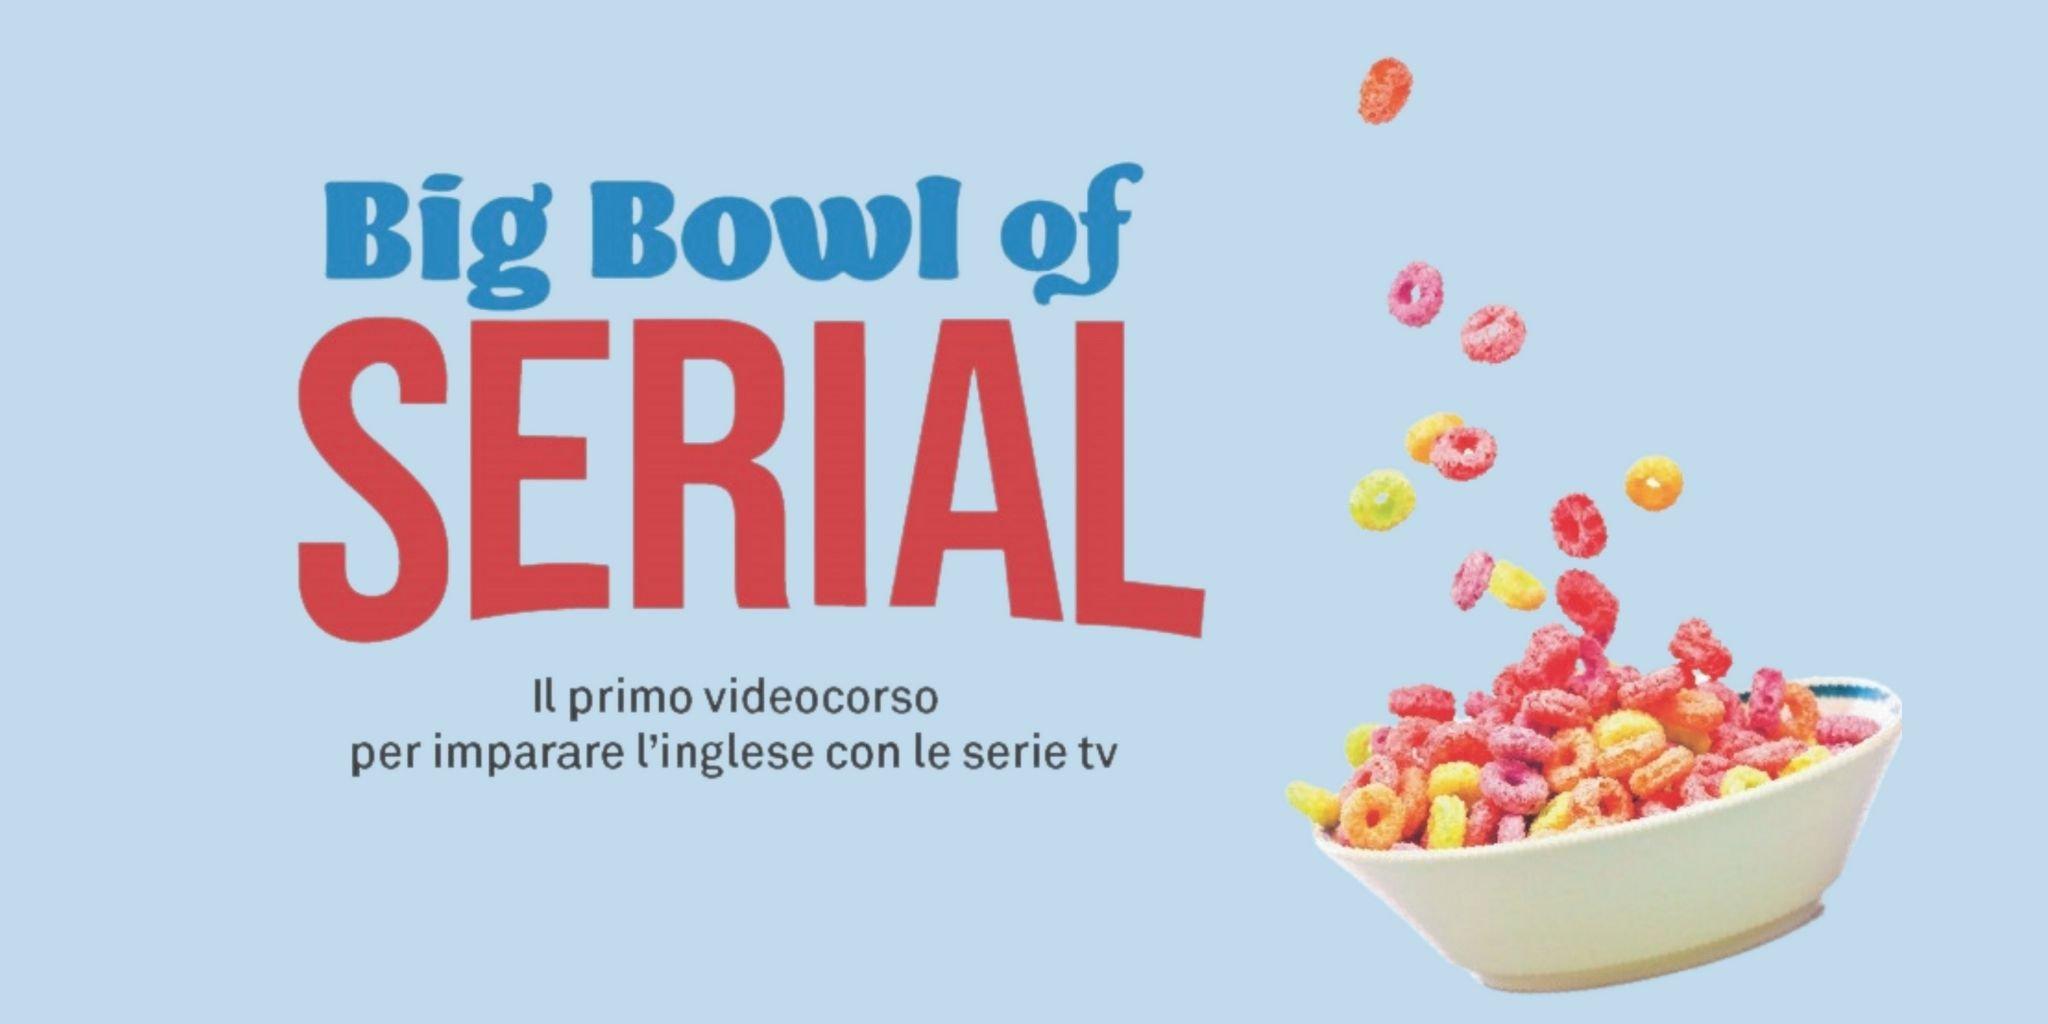 big bowl of serial imparare inglese serie tv